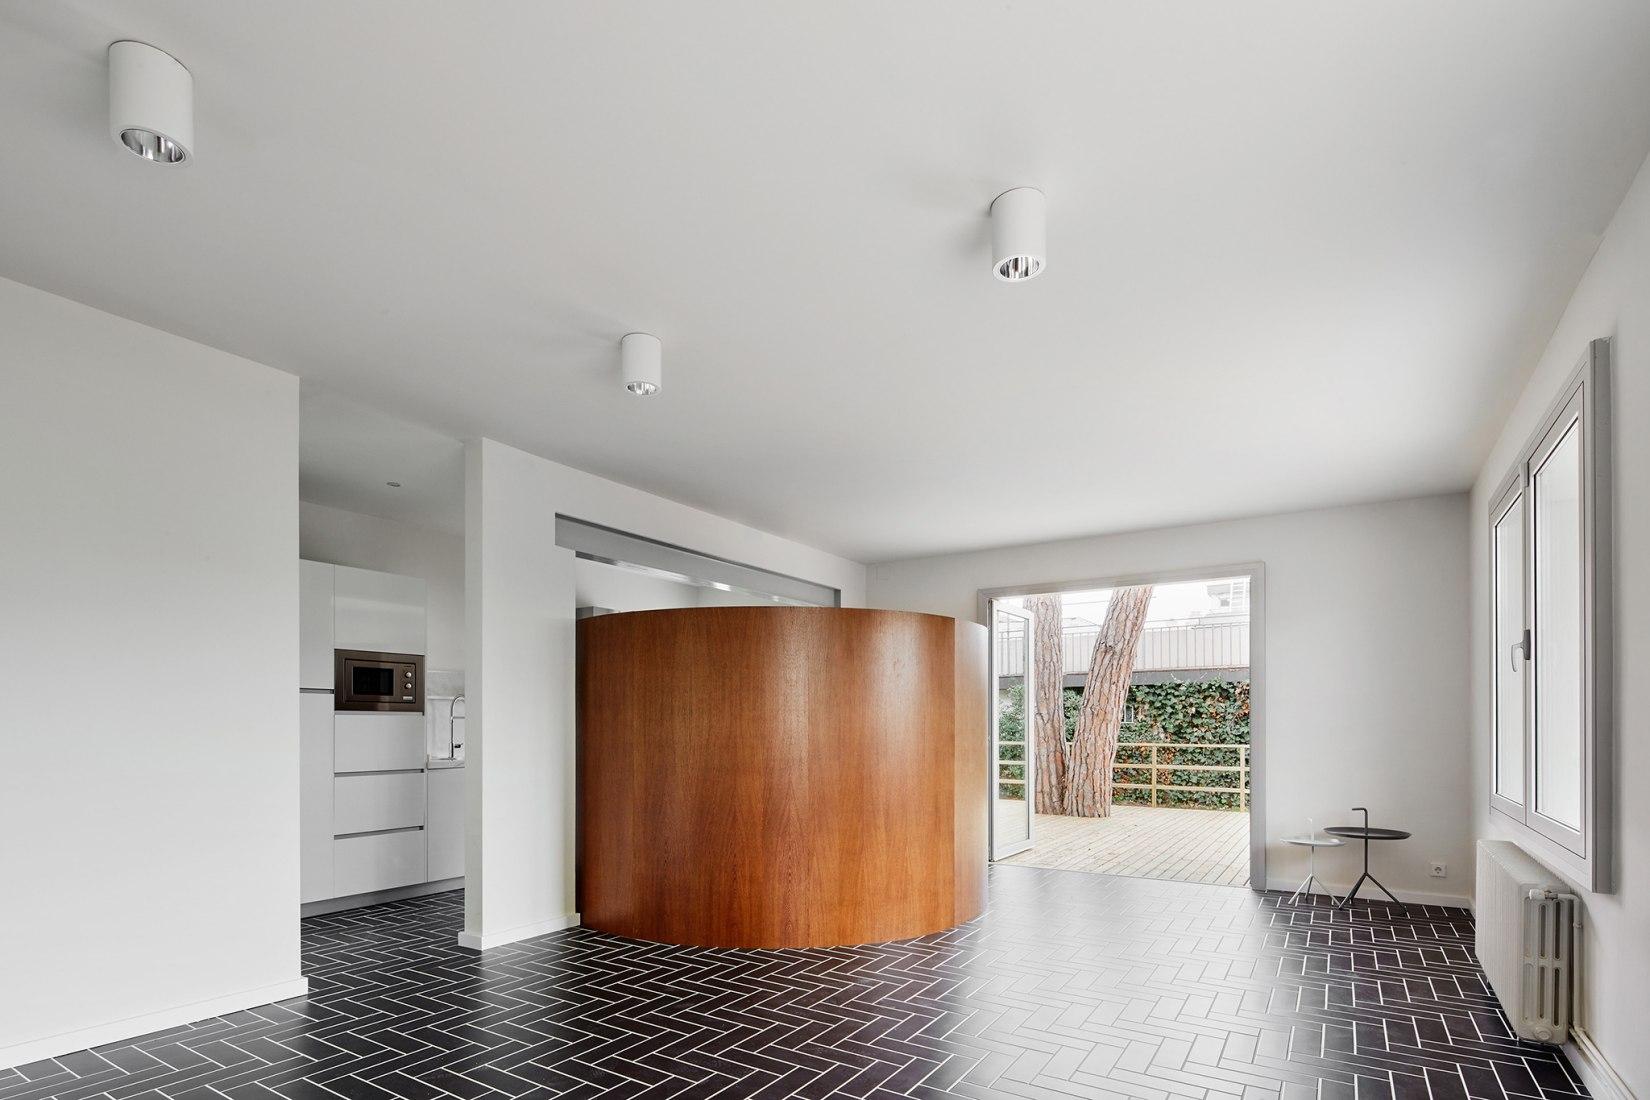 Living room view. House 1016. Photograph © José Hevia.